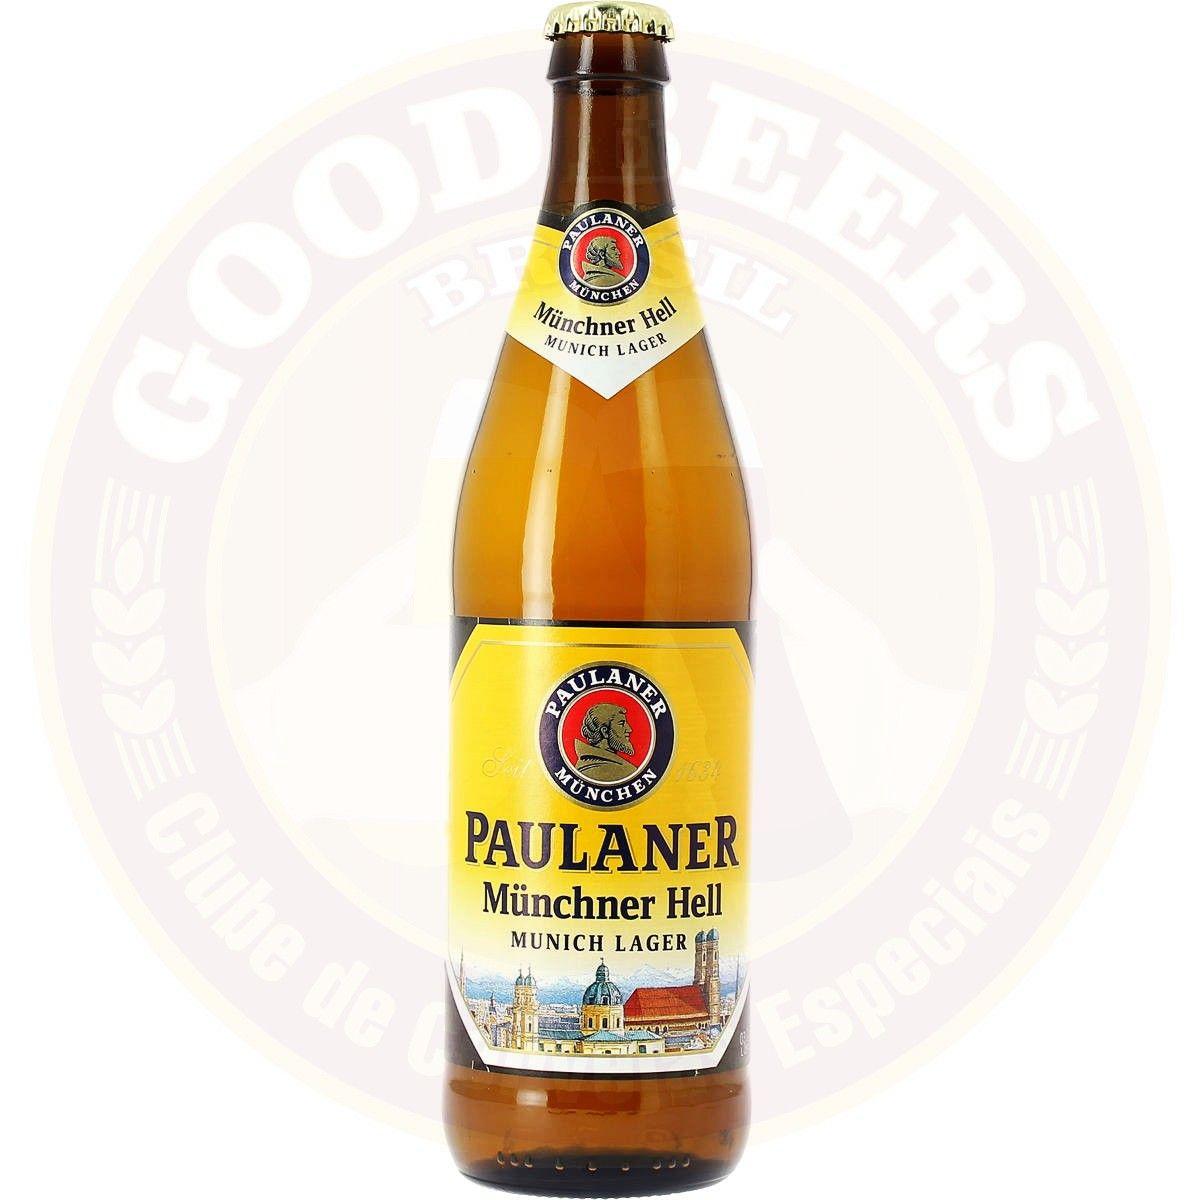 Paulaner Original Munchner Hell - 500 ml - Alemanha - País - Cerveja por - Good Beers Brasil